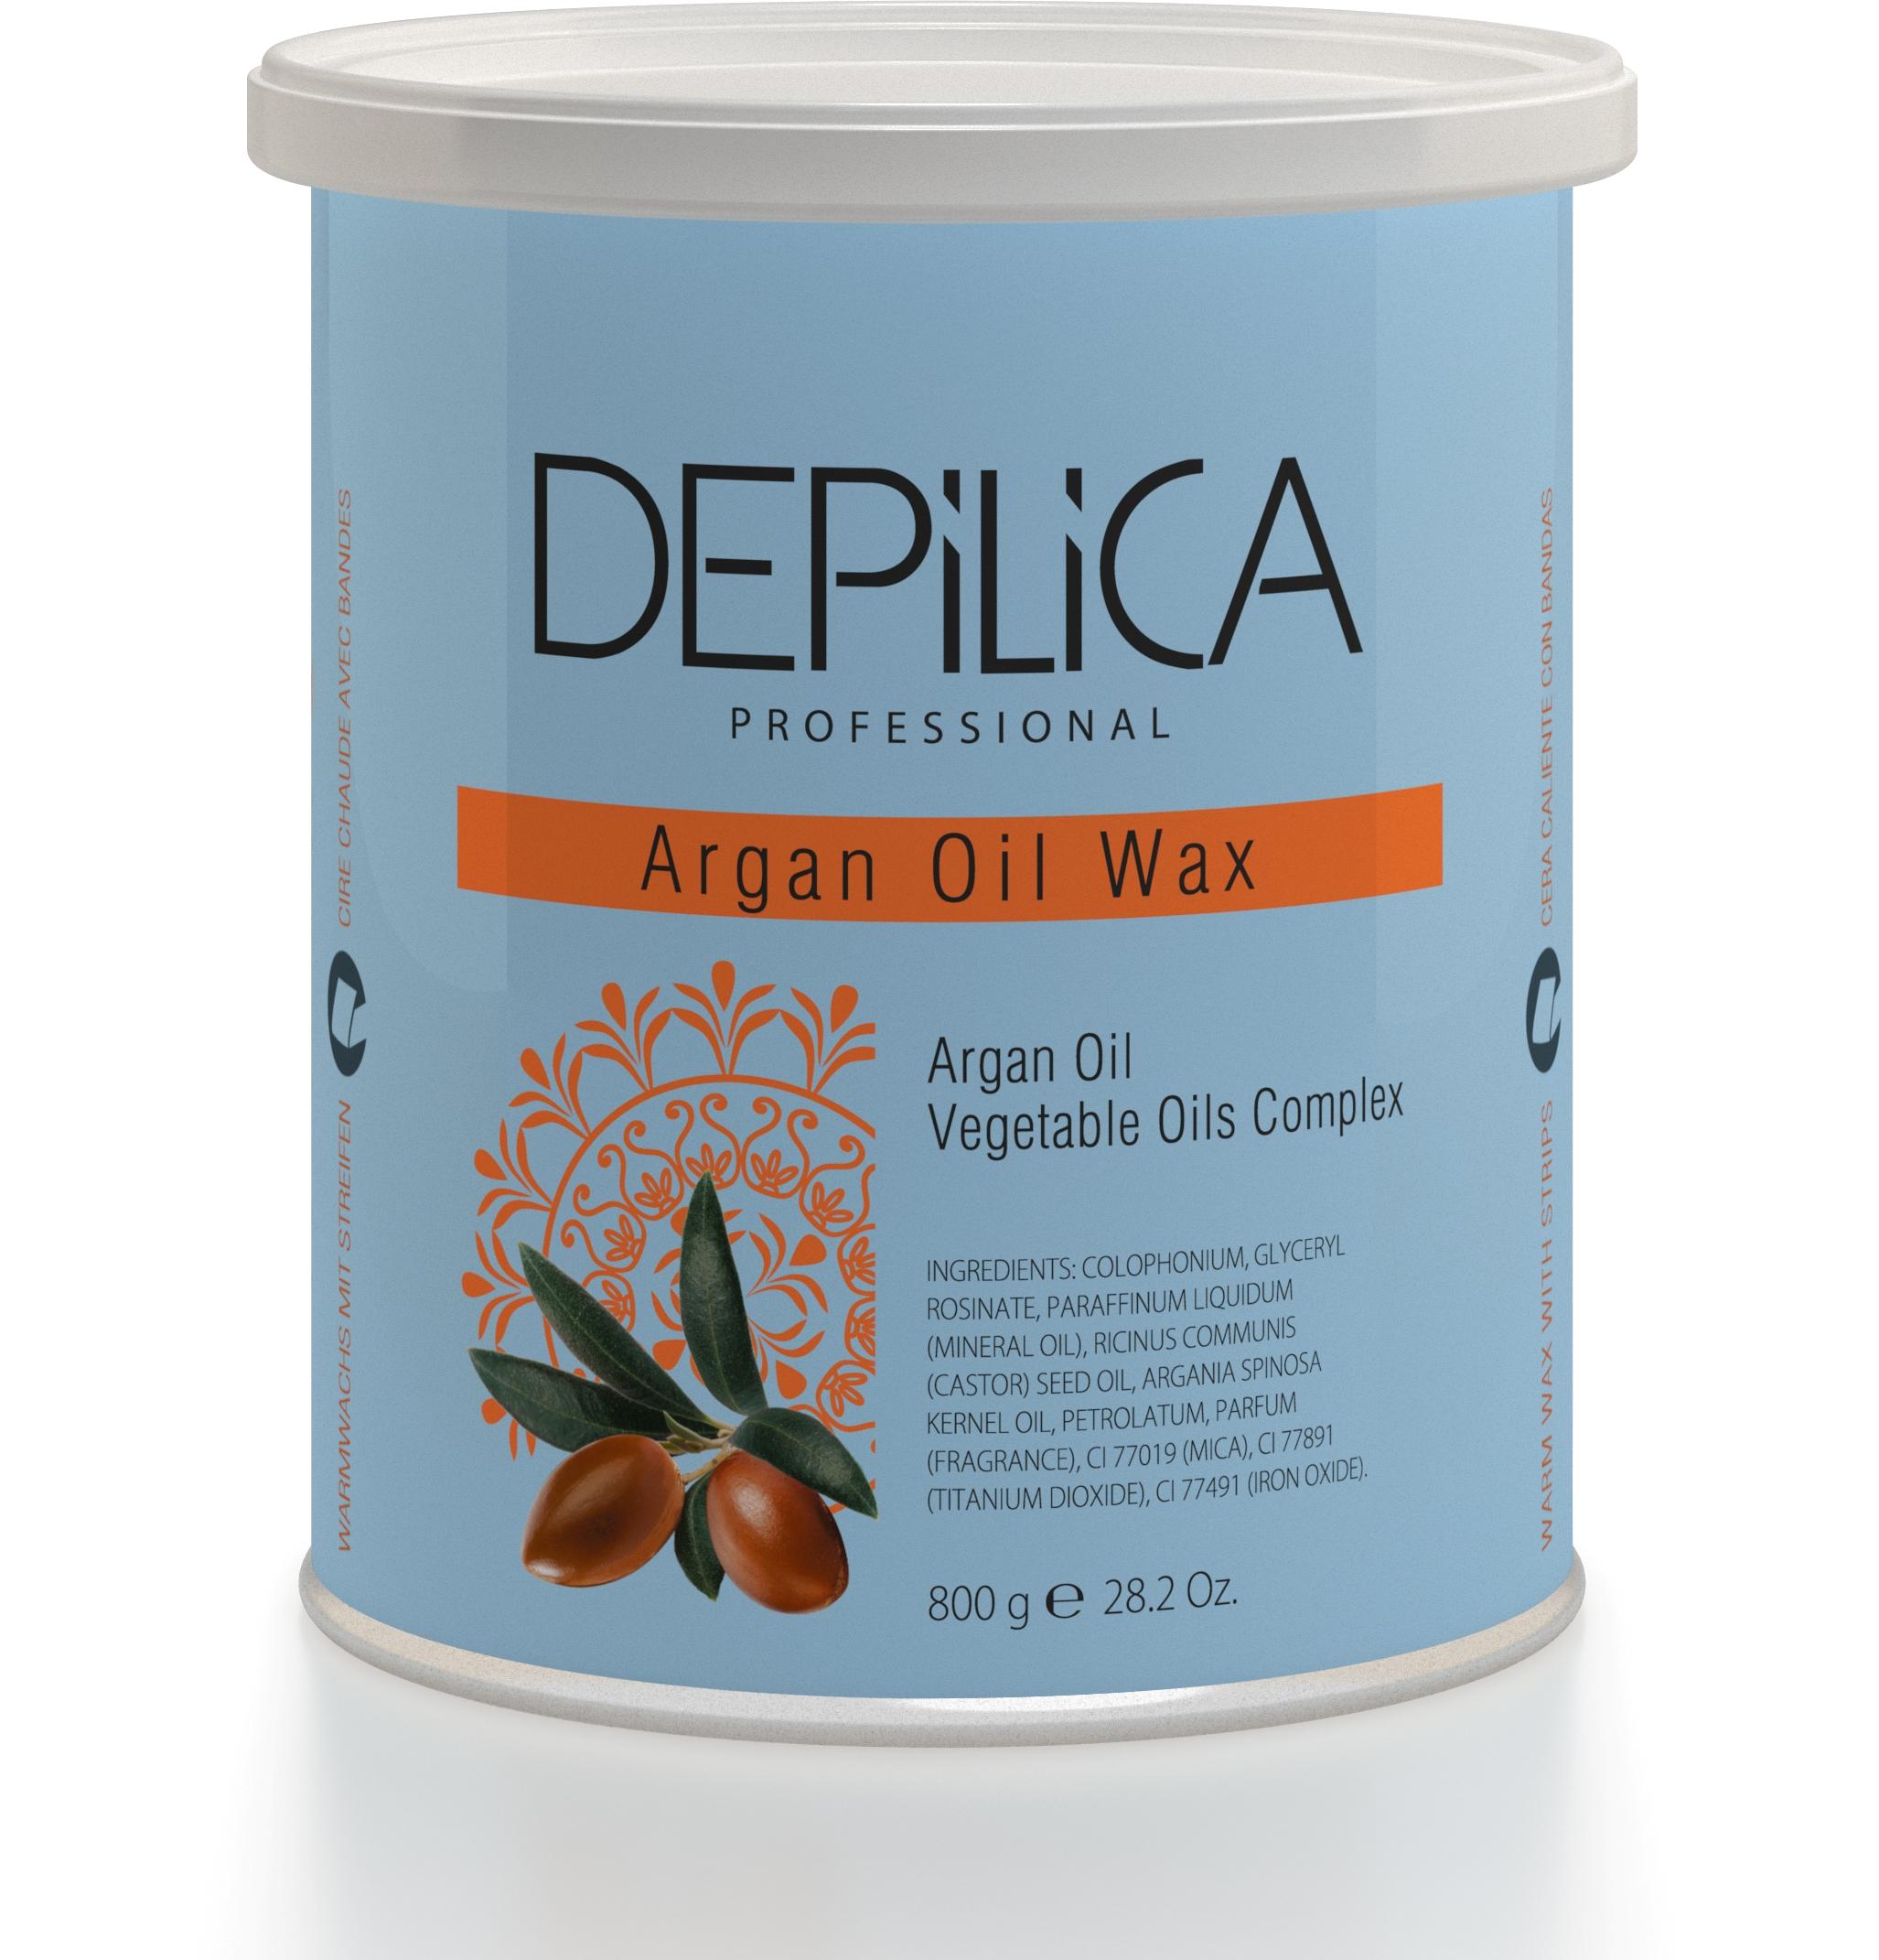 DEPILICA PROFESSIONAL ���� ������ � ������ ������ / Argana Oil Warm Wax 800��